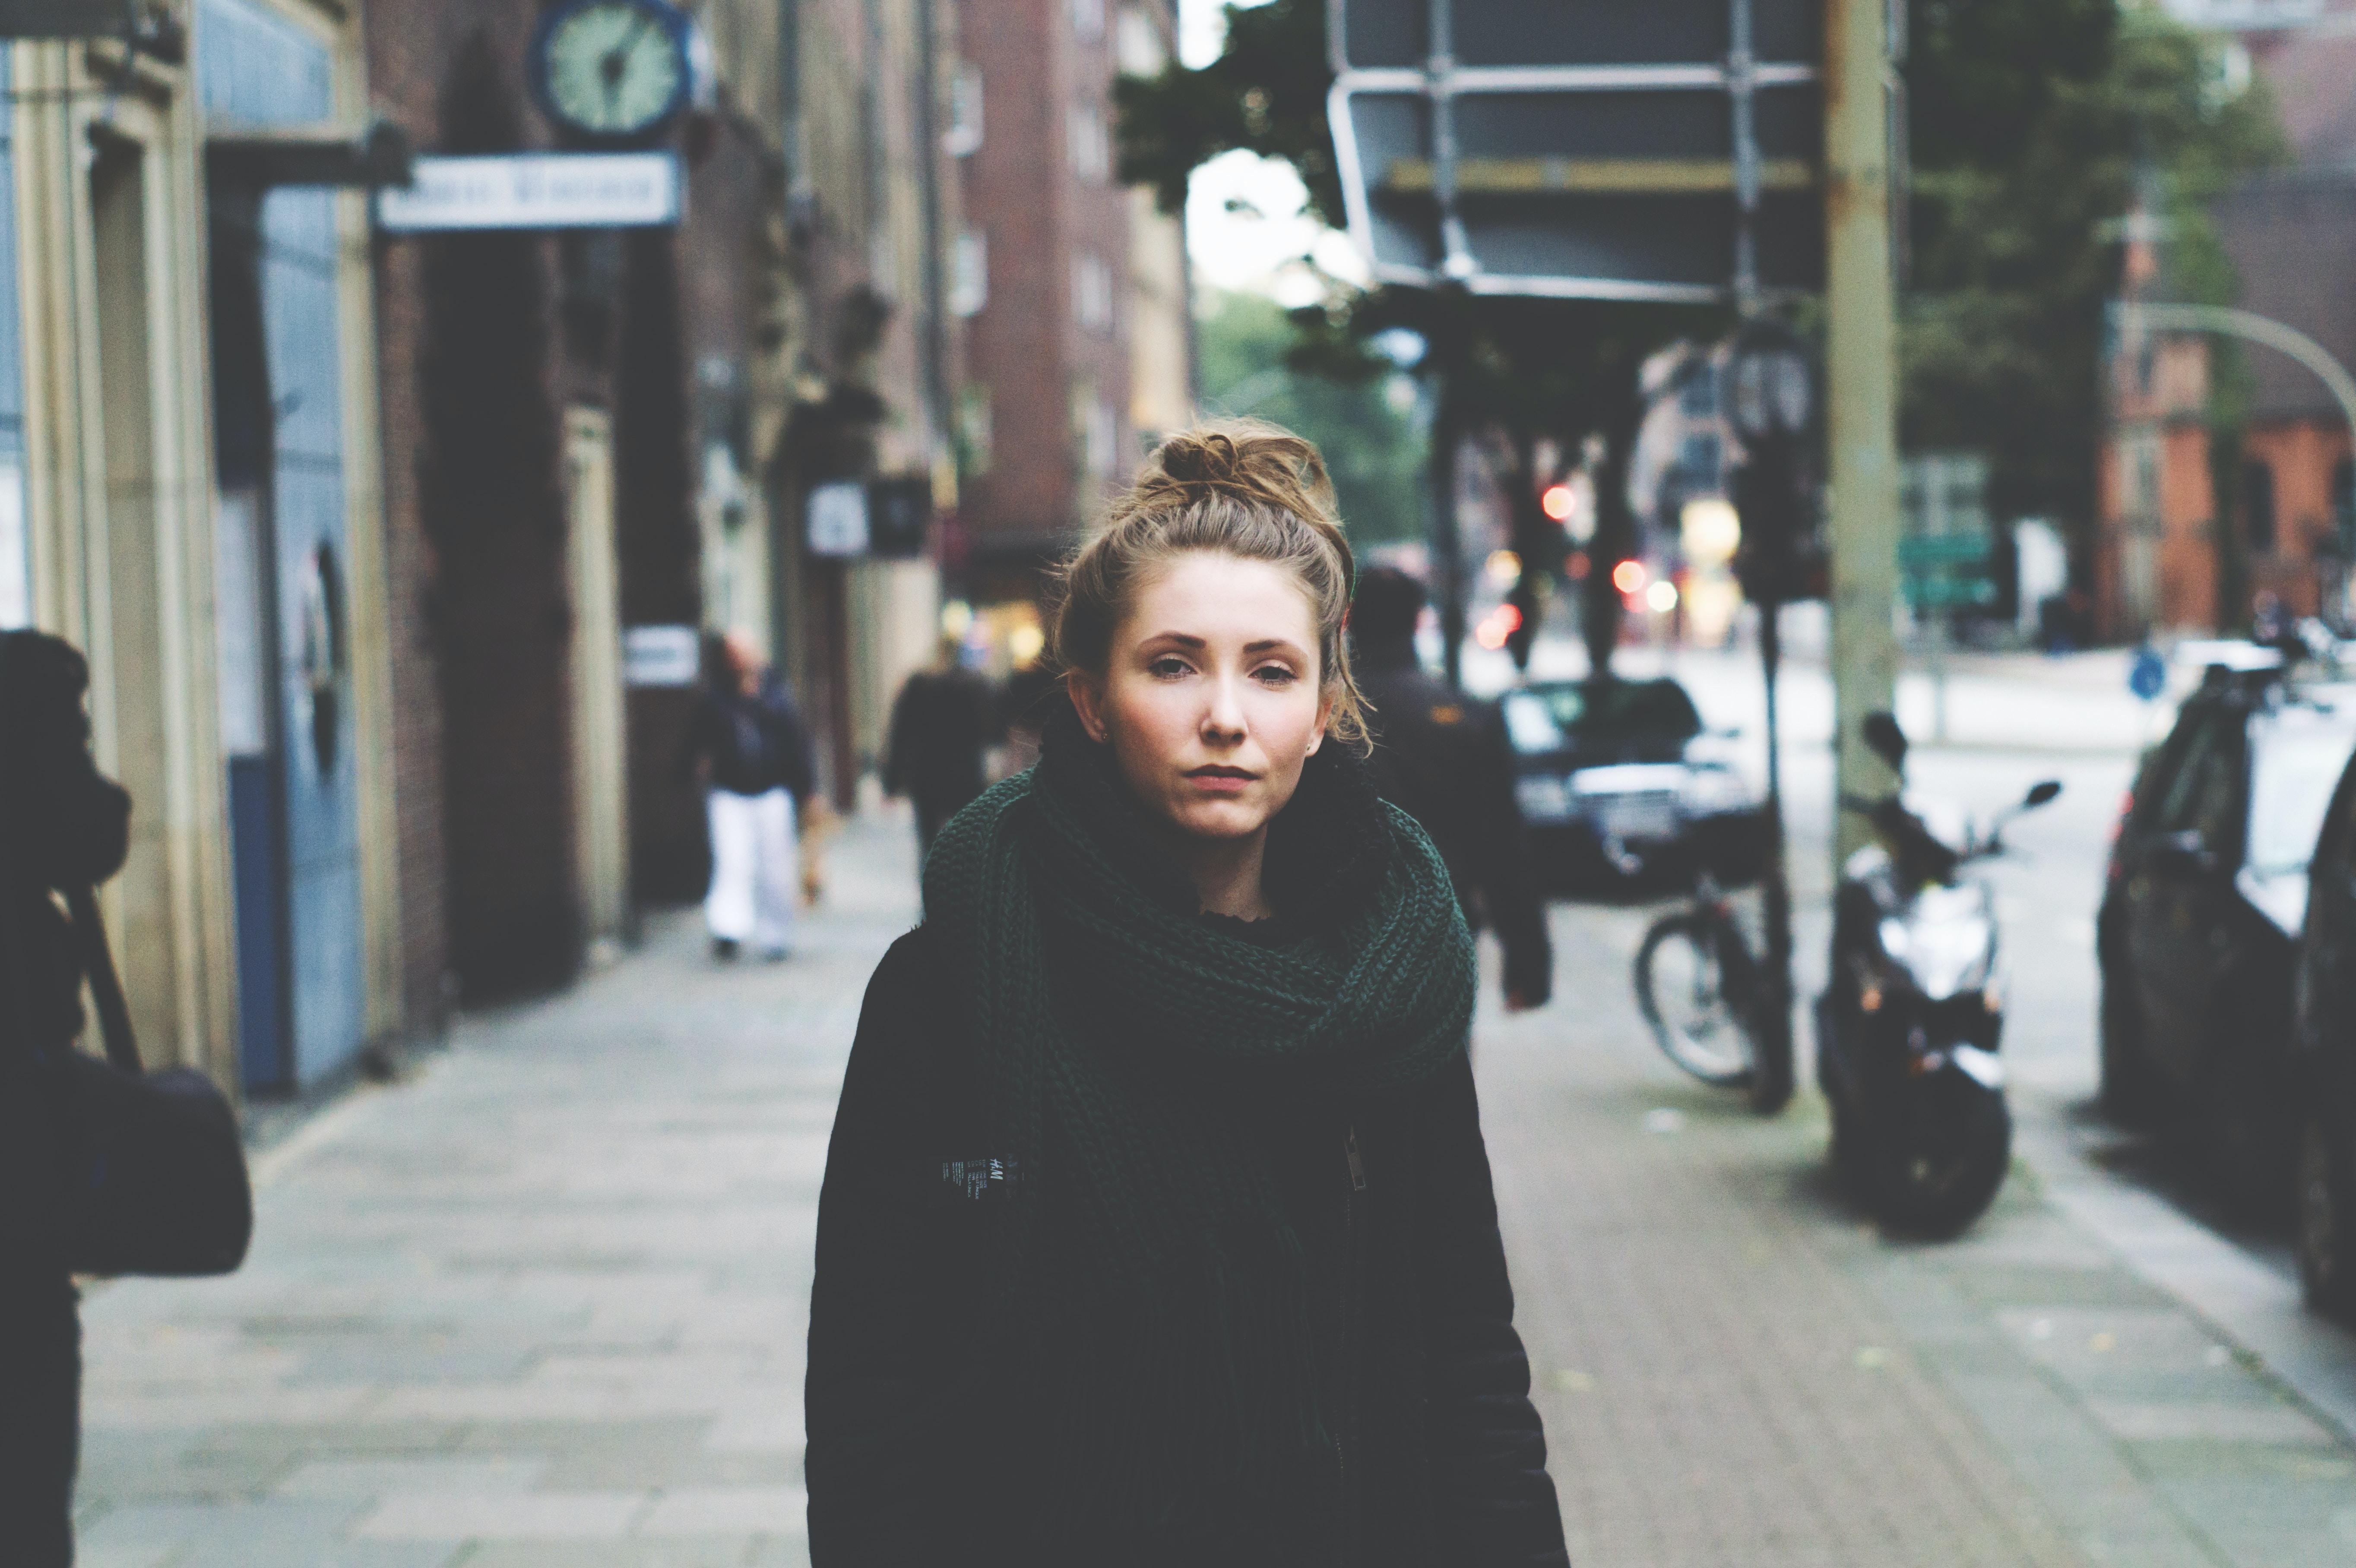 woman standing on sidewalk